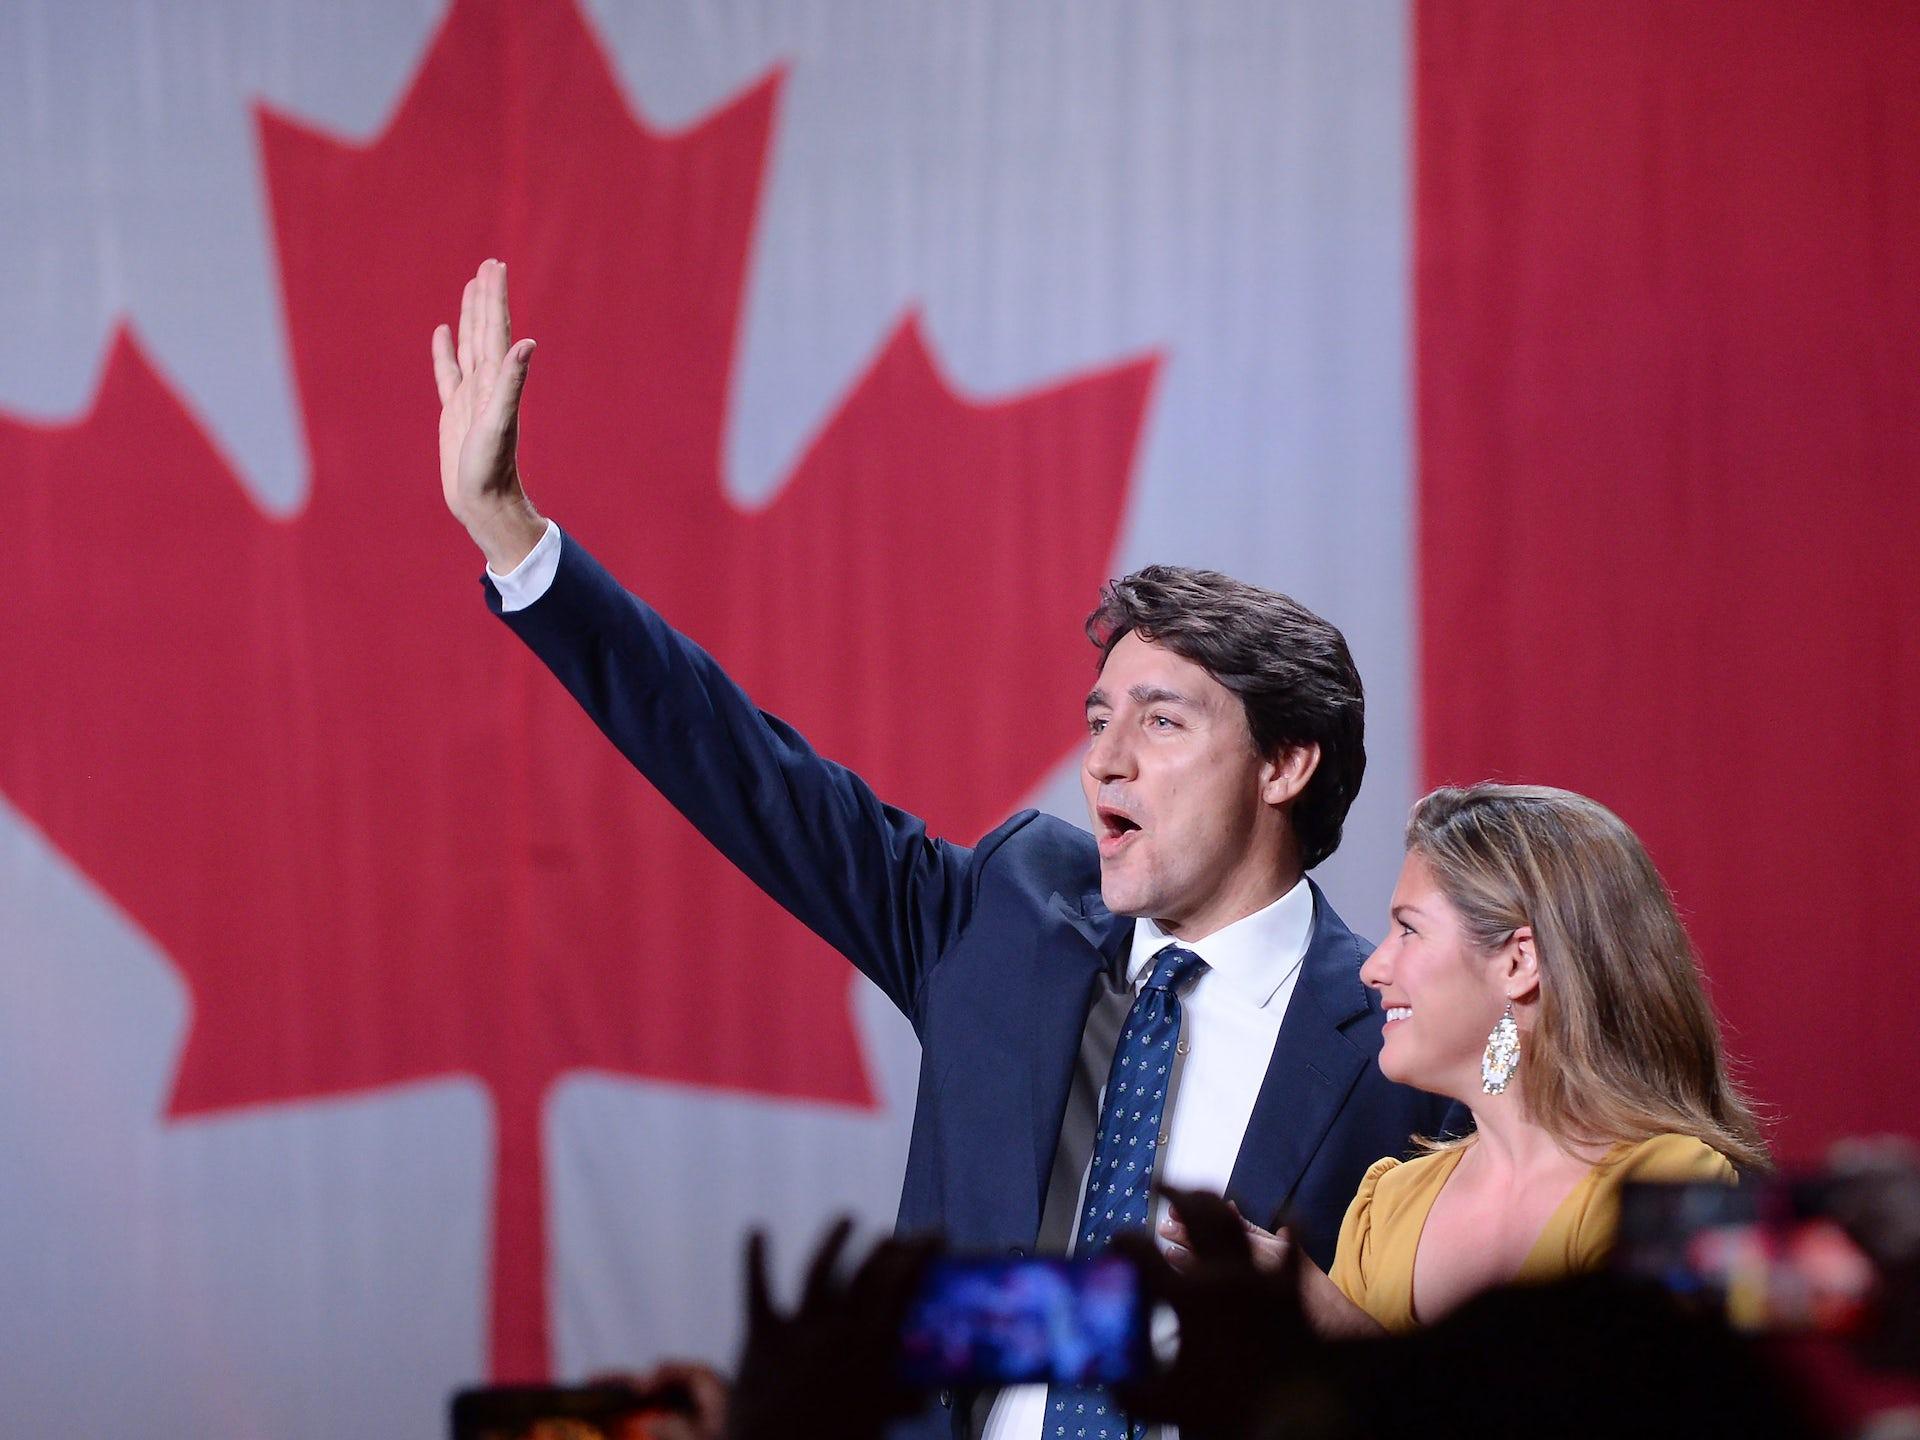 Trudeaumania The Rise to Power of Pierre Elliott Trudeau